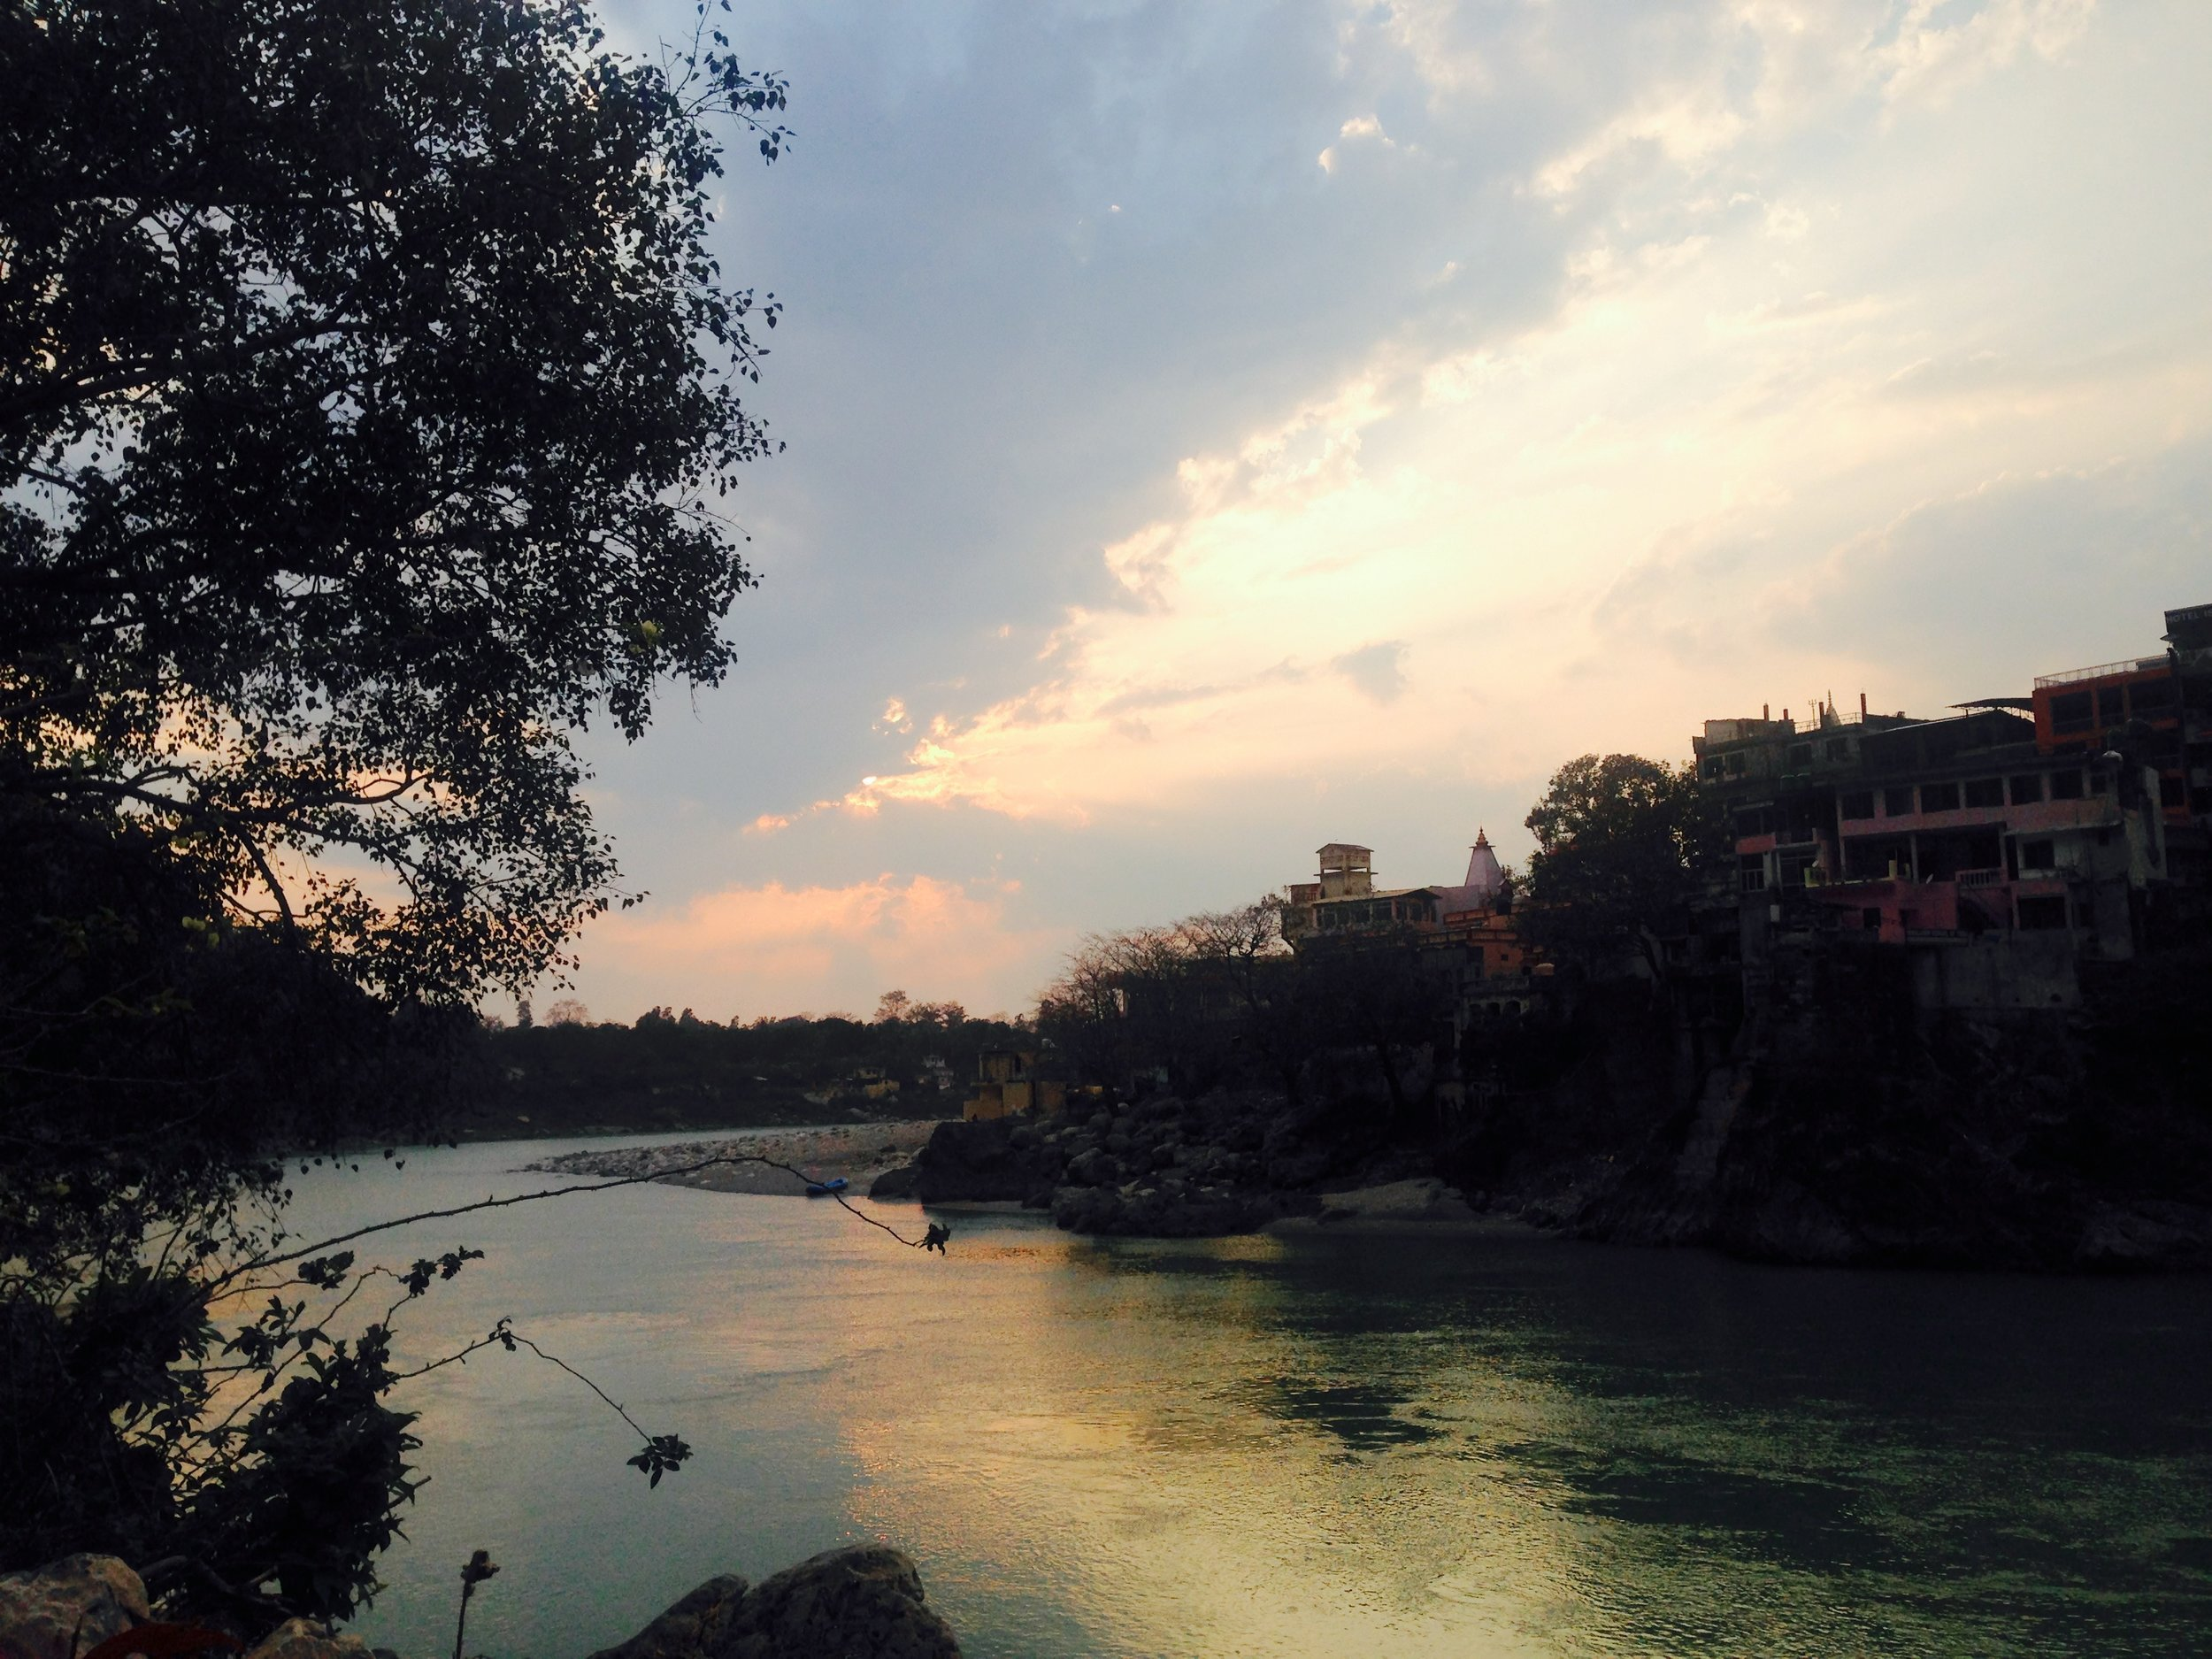 Last view of the Ganga sunset